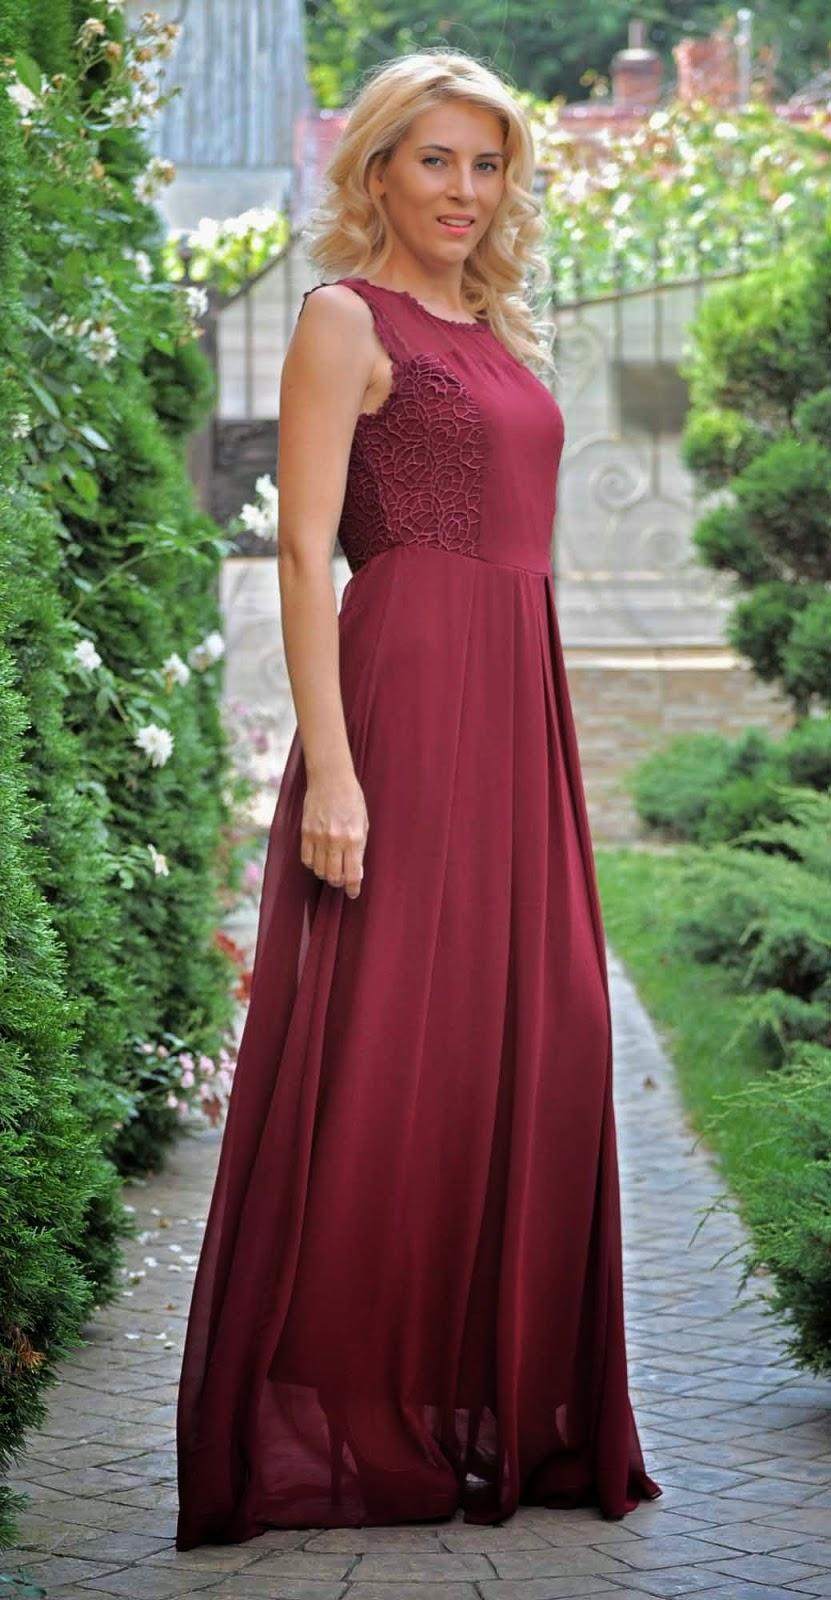 Modele de rochii de seara